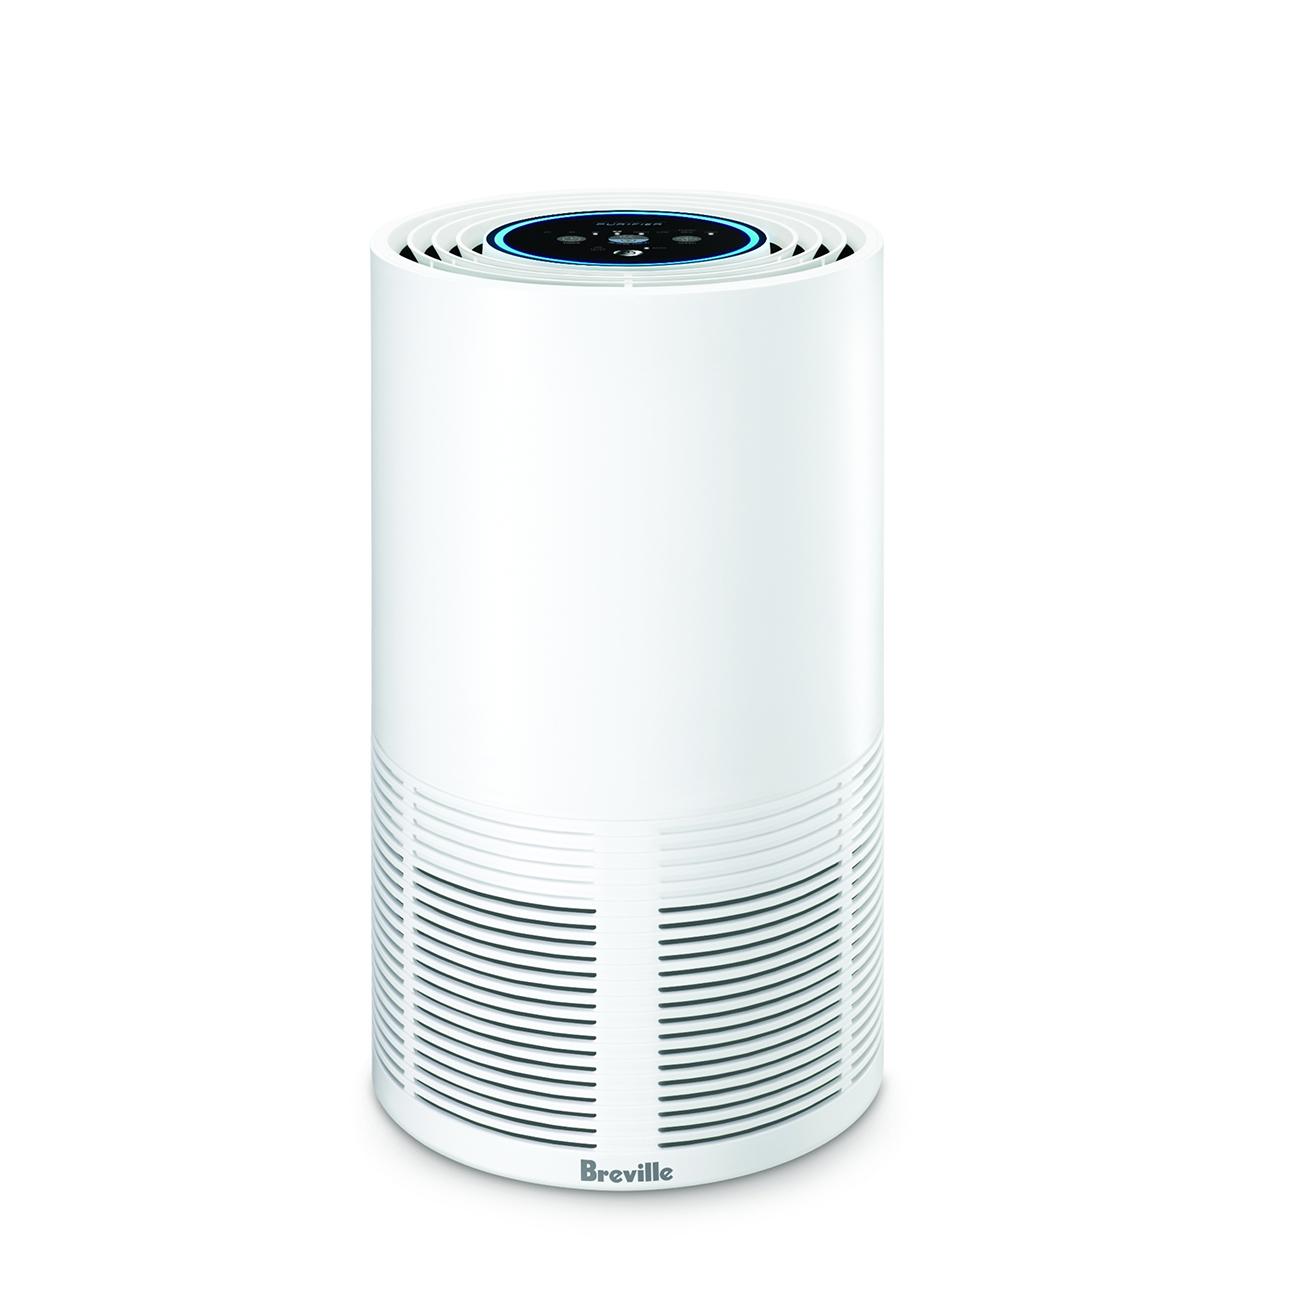 The Smart Air Purifier Breville